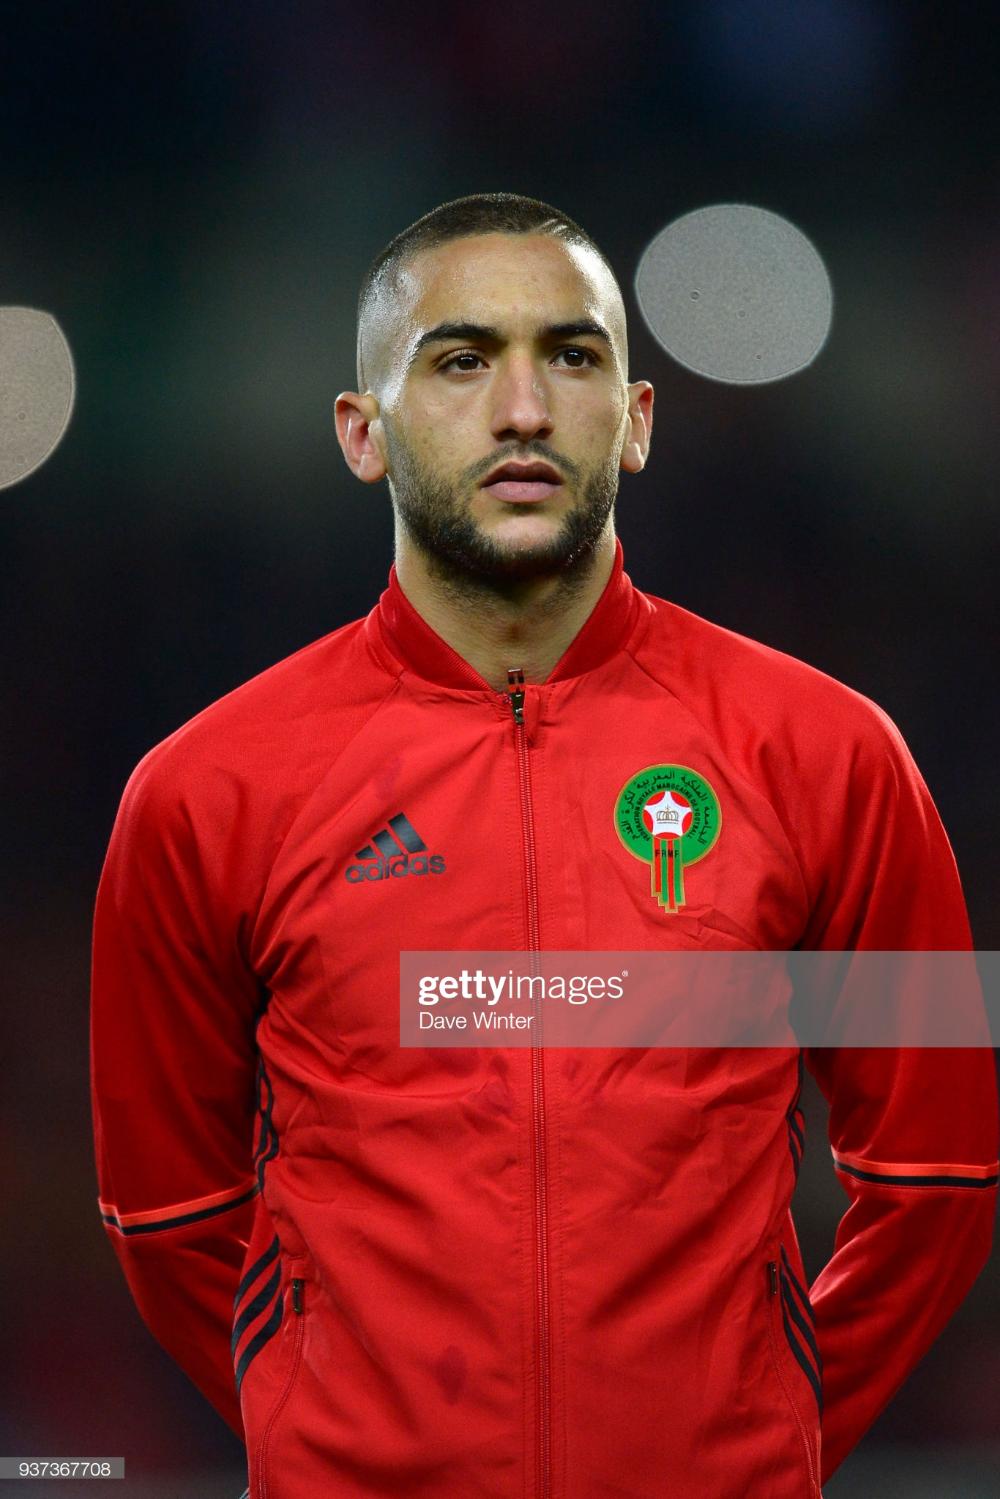 Hakim Ziyech Of Morocco During The International Friendly Match In 2020 Sports Magazine Sport Football Hakim Ziyech